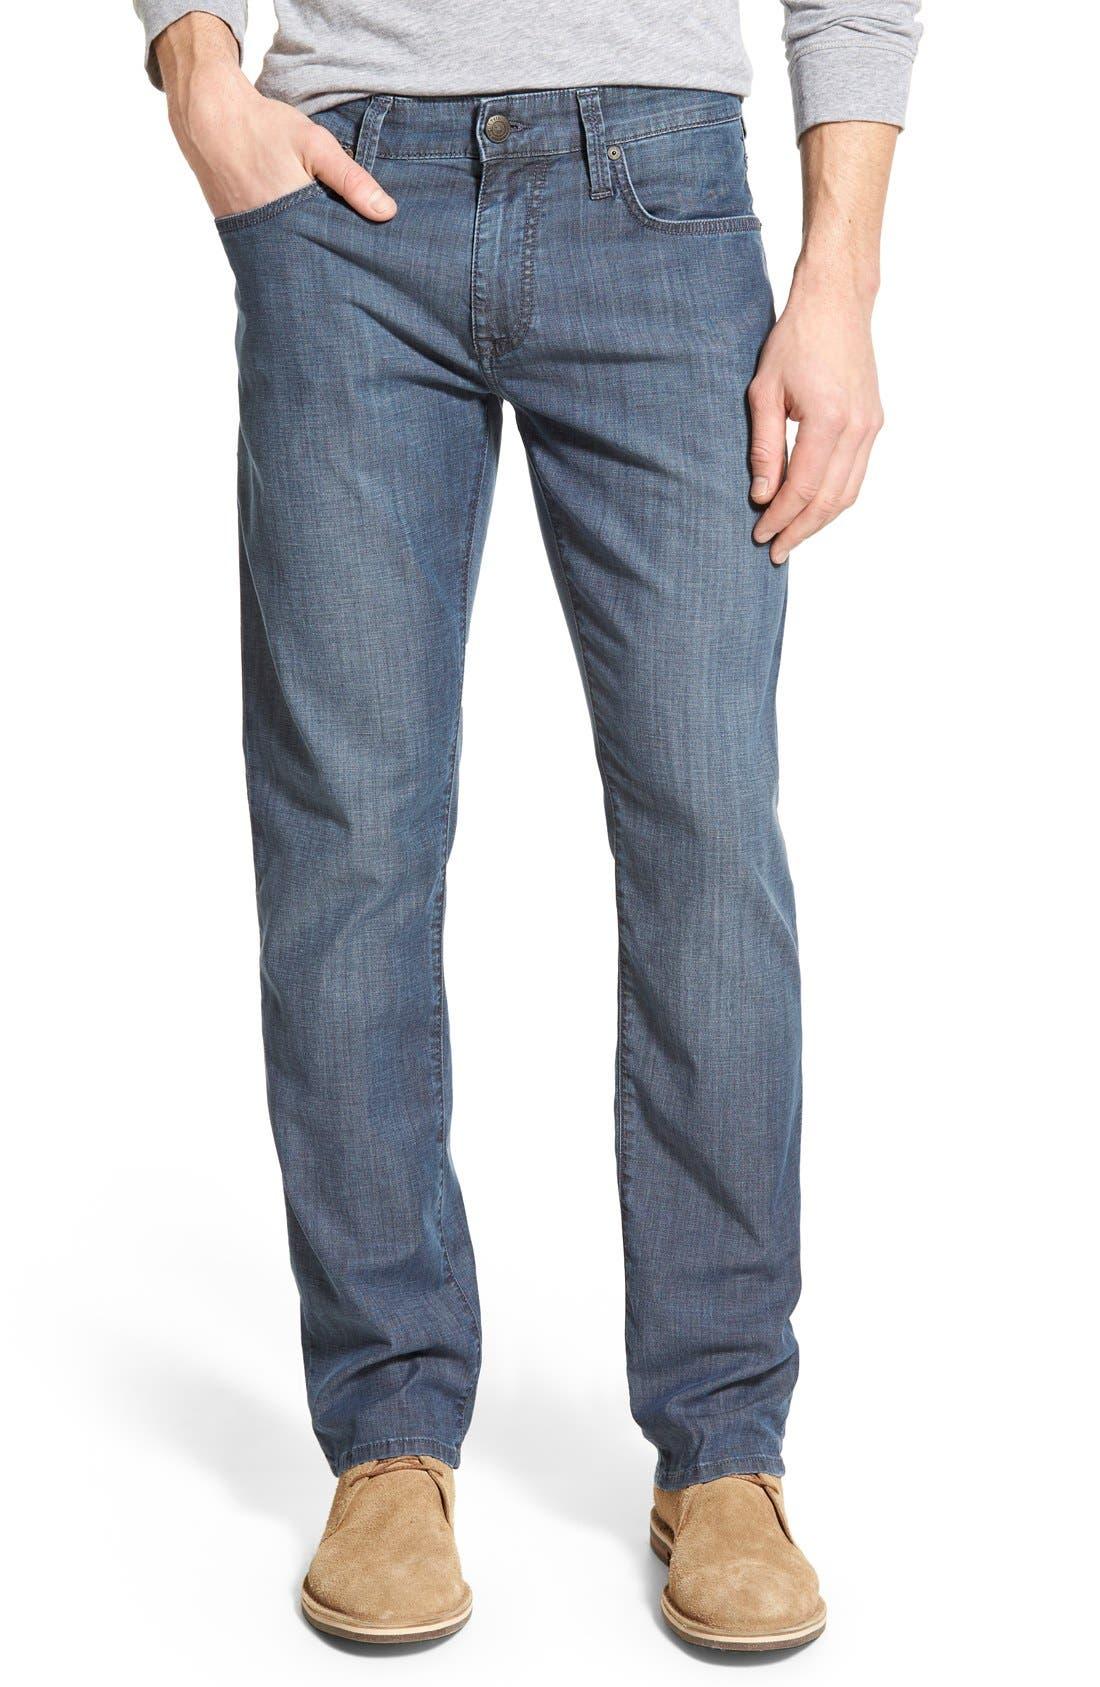 'Zach' Straight Leg Jeans,                             Main thumbnail 1, color,                             400